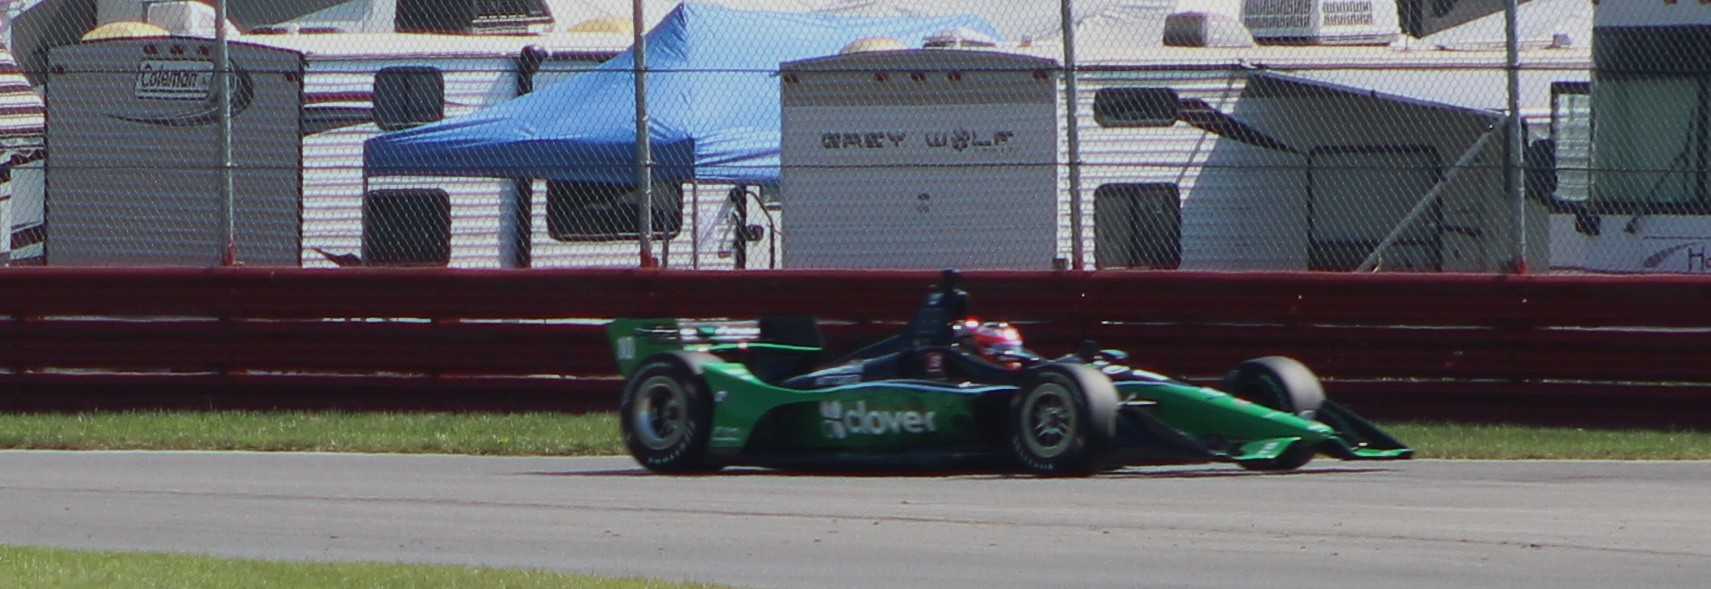 mo19 081